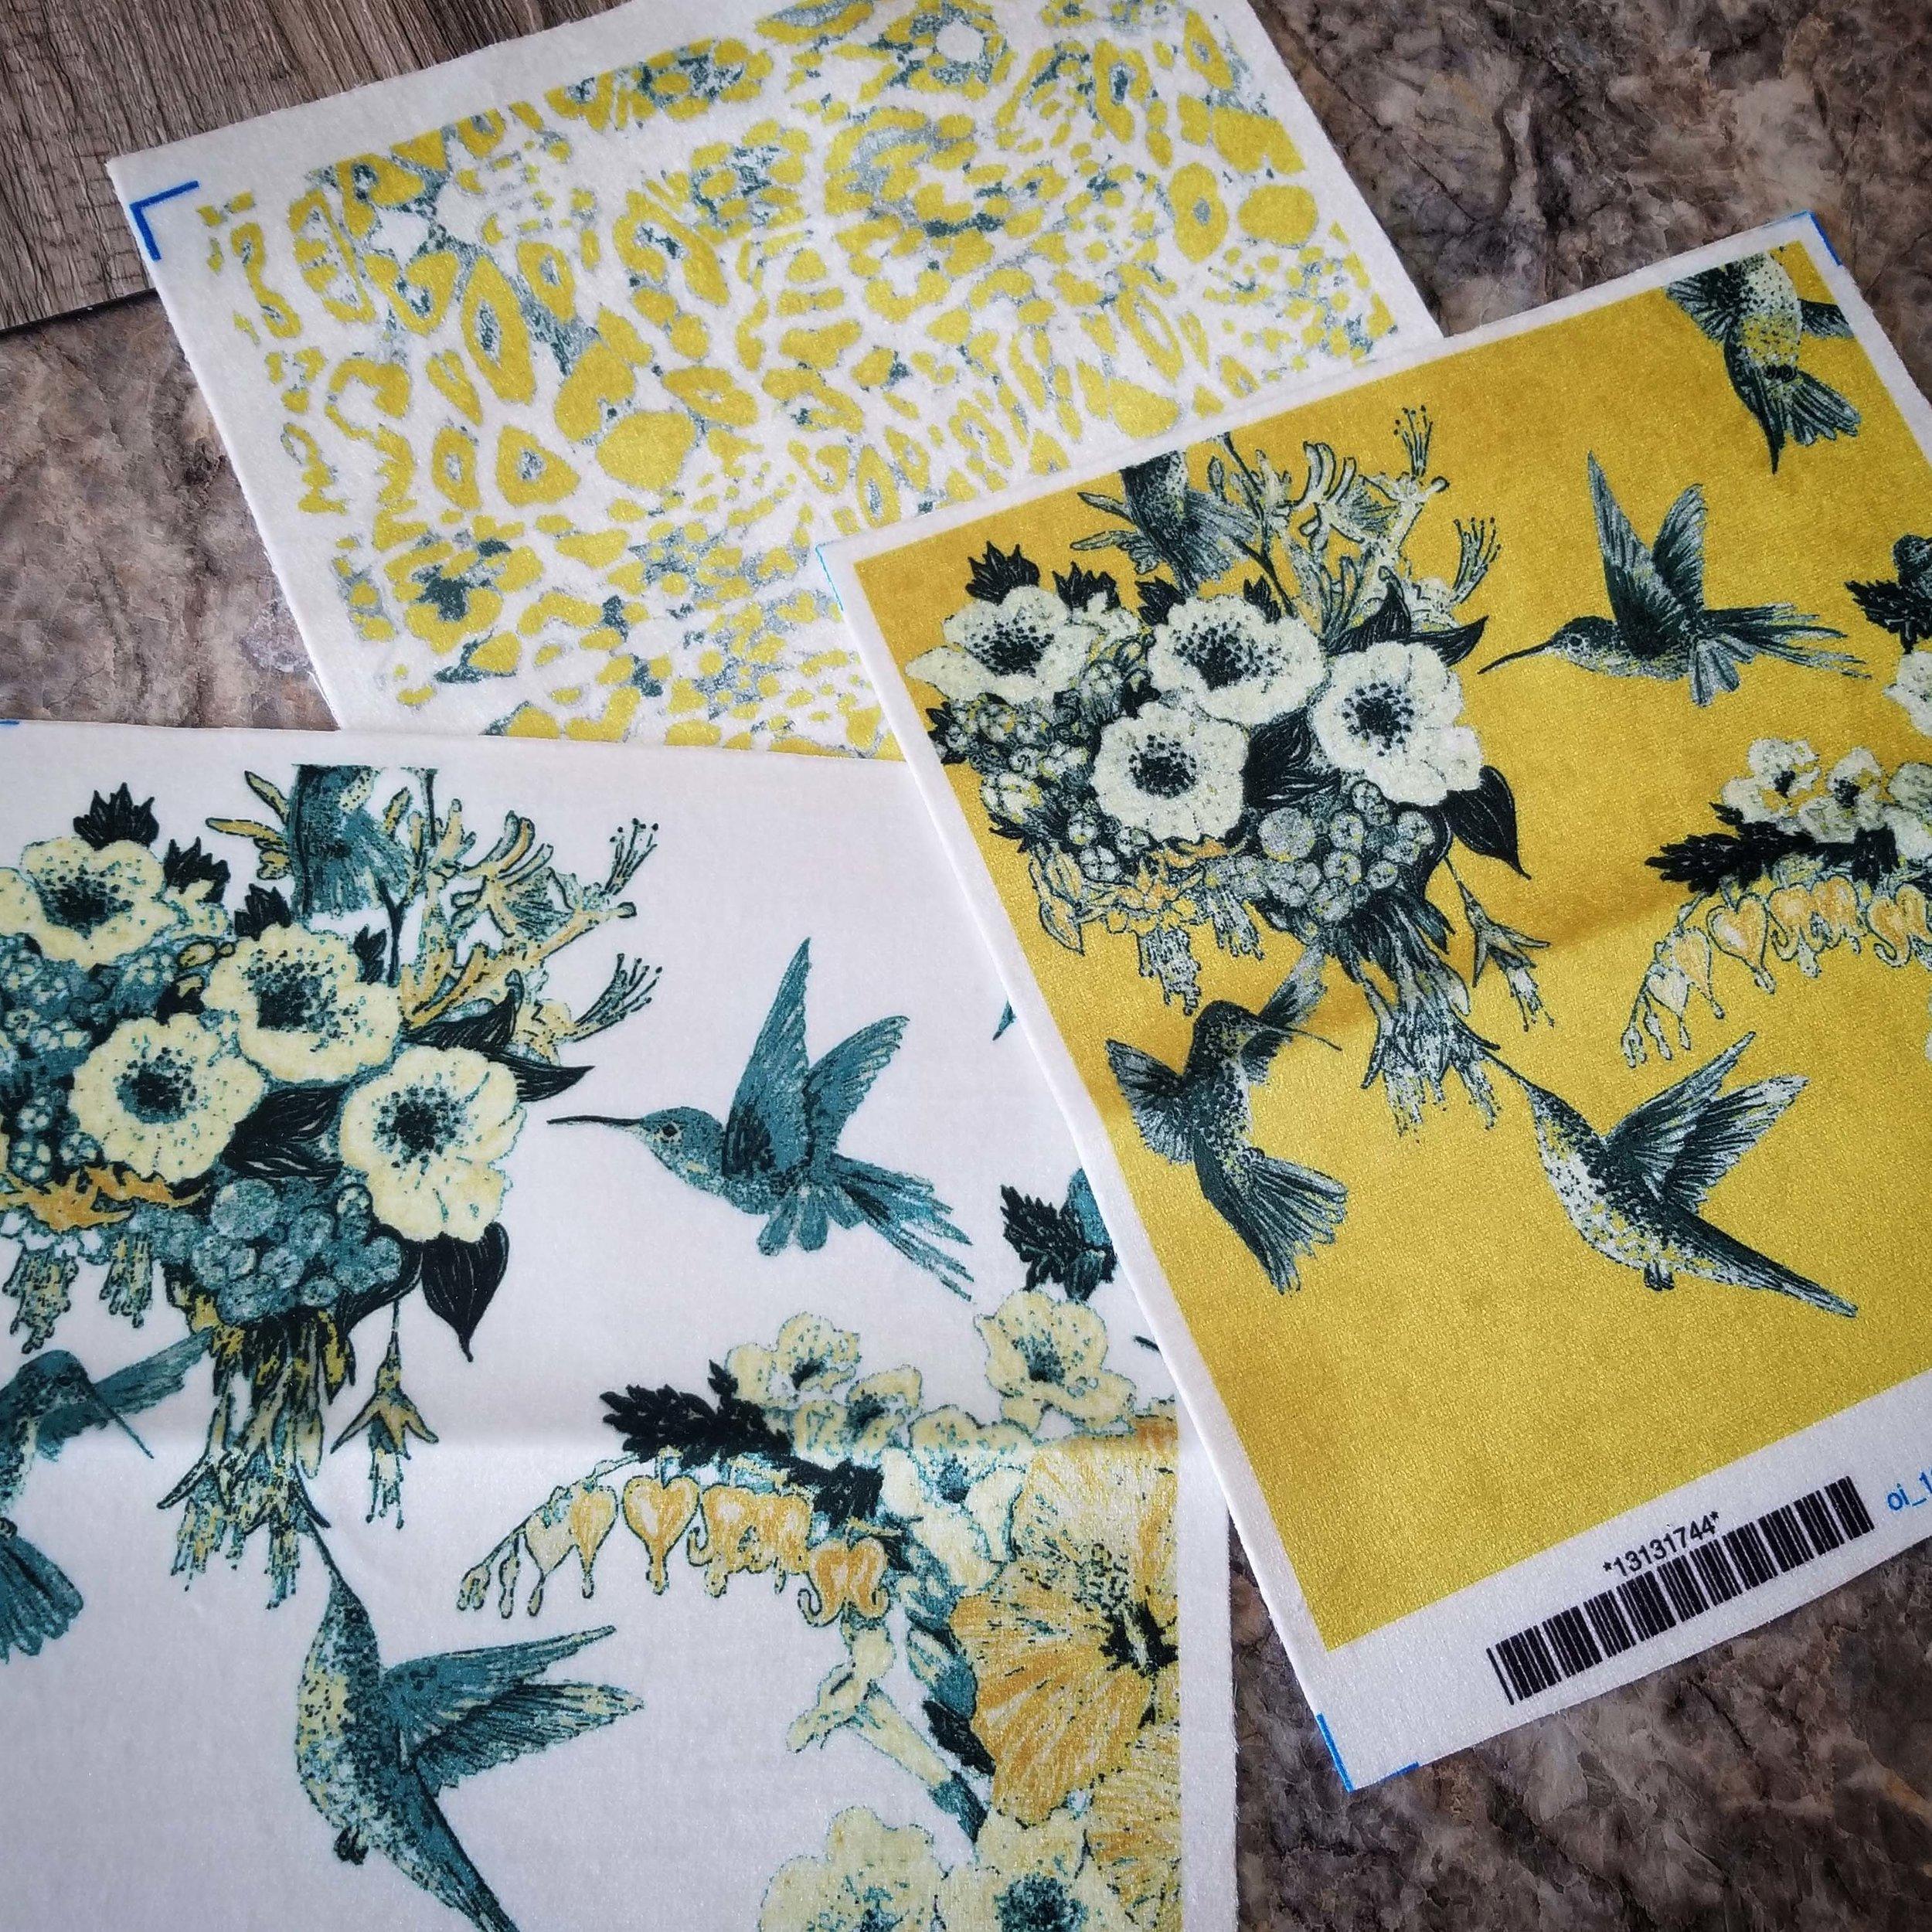 Wallpaper fabric ideas on the ceramic floor